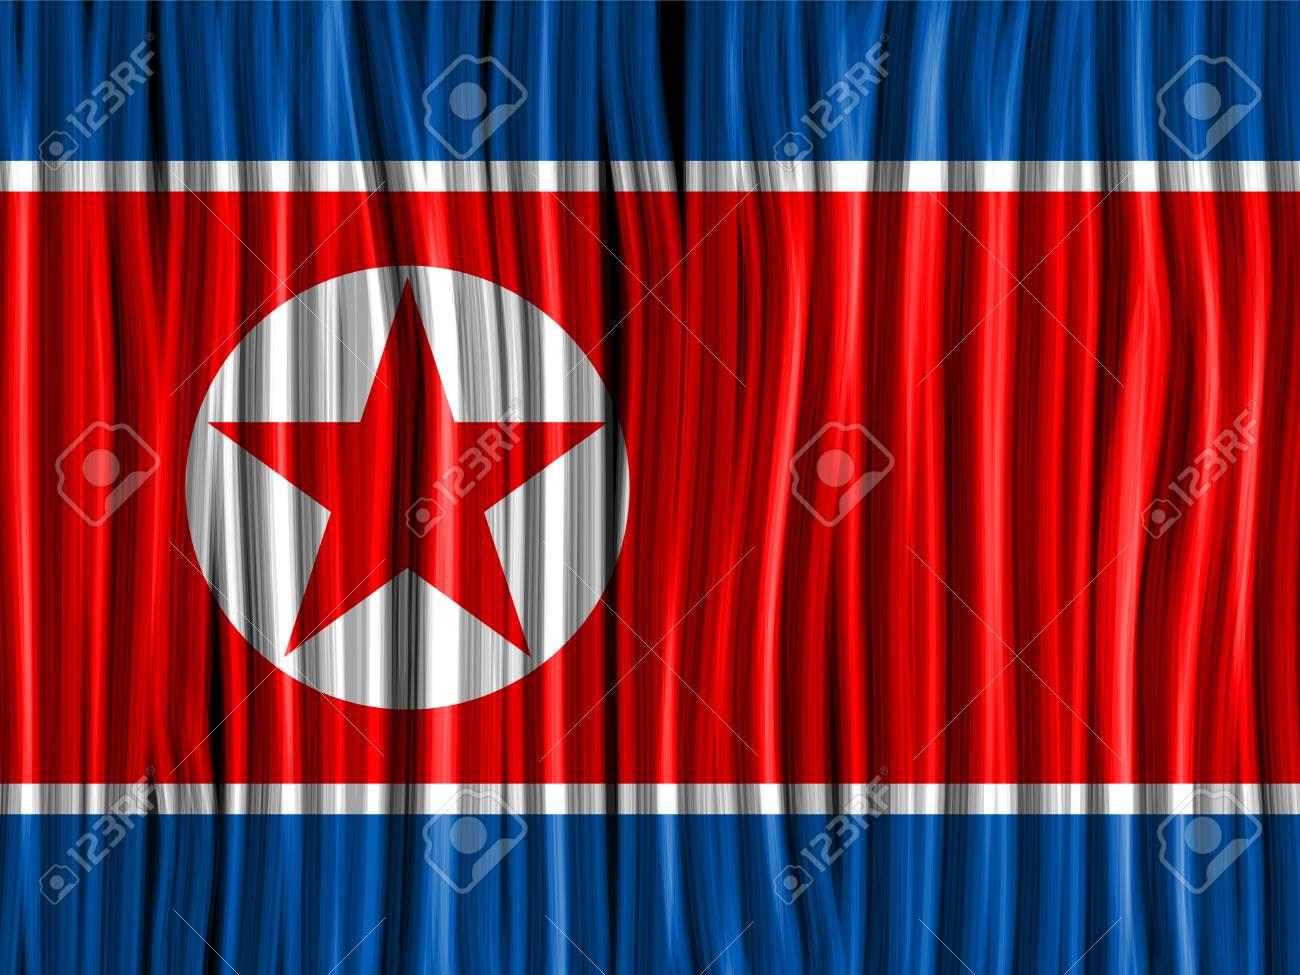 Vector - North Korea Flag Wave Fabric Texture Background Stock Vector - 23356868